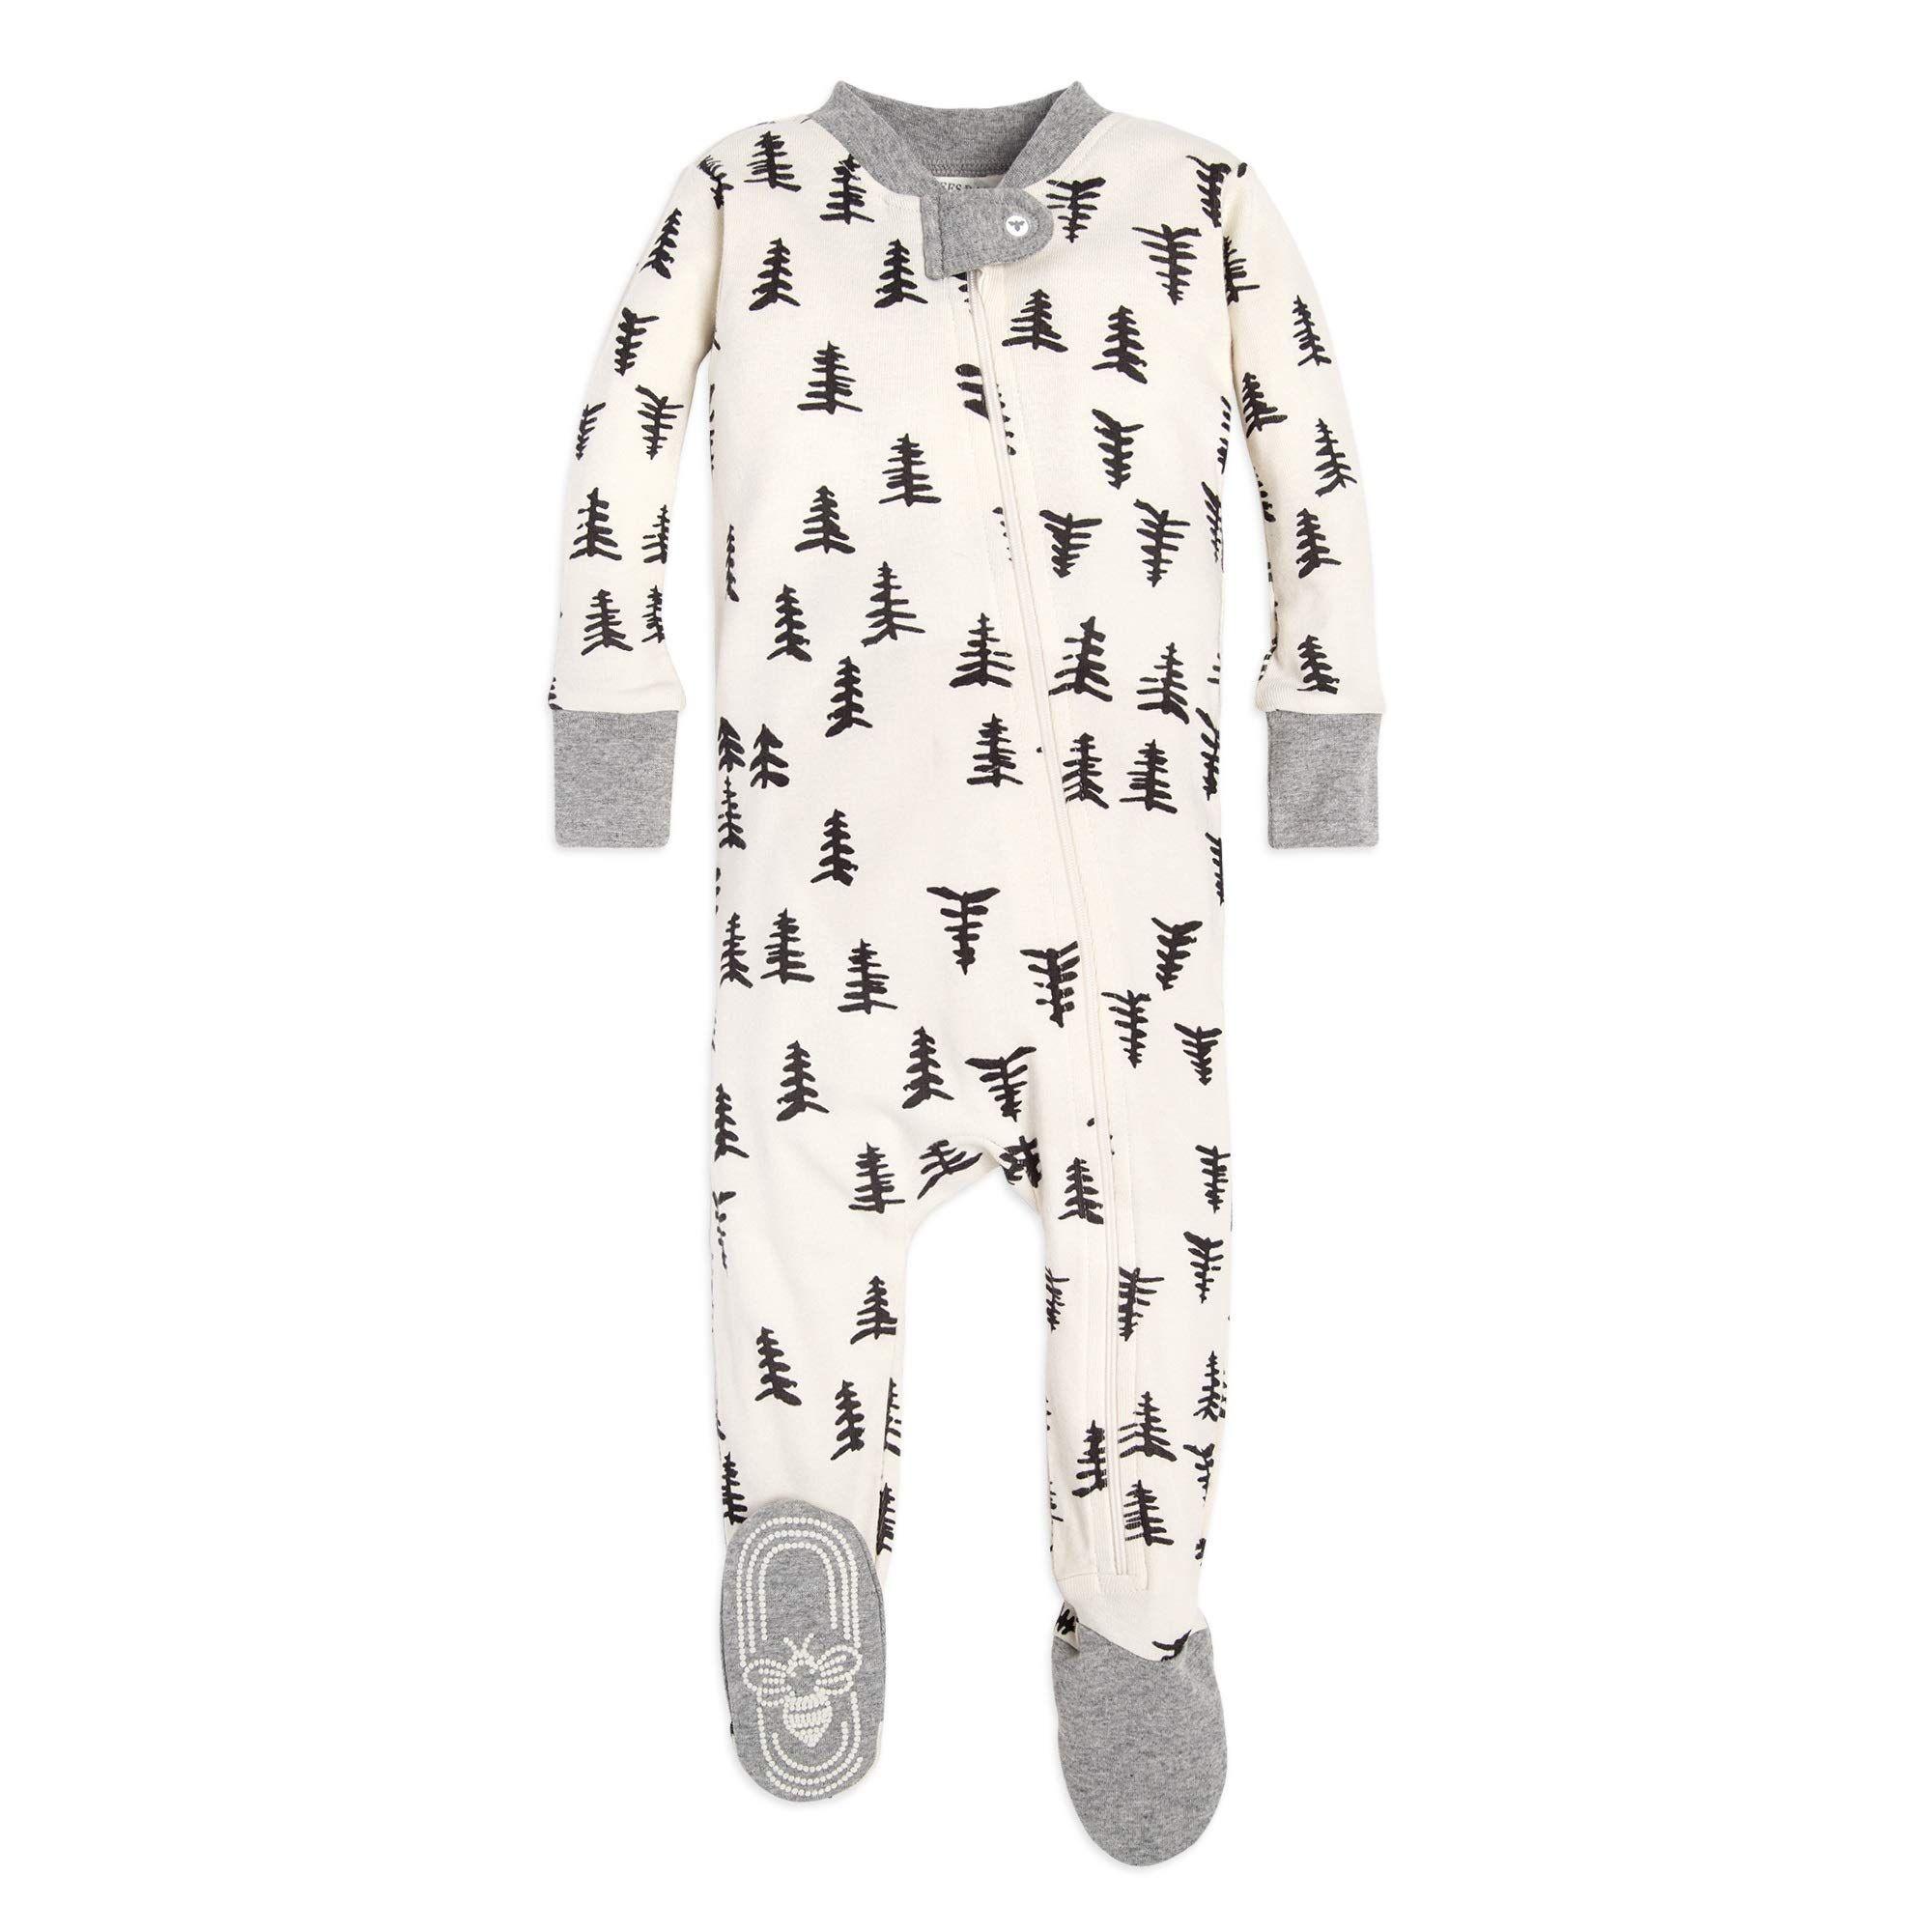 Burts Bees Baby Baby Boys Unisex Pajamas Zip-Front Non-Slip Footed Sleeper Pjs Organic Cotton